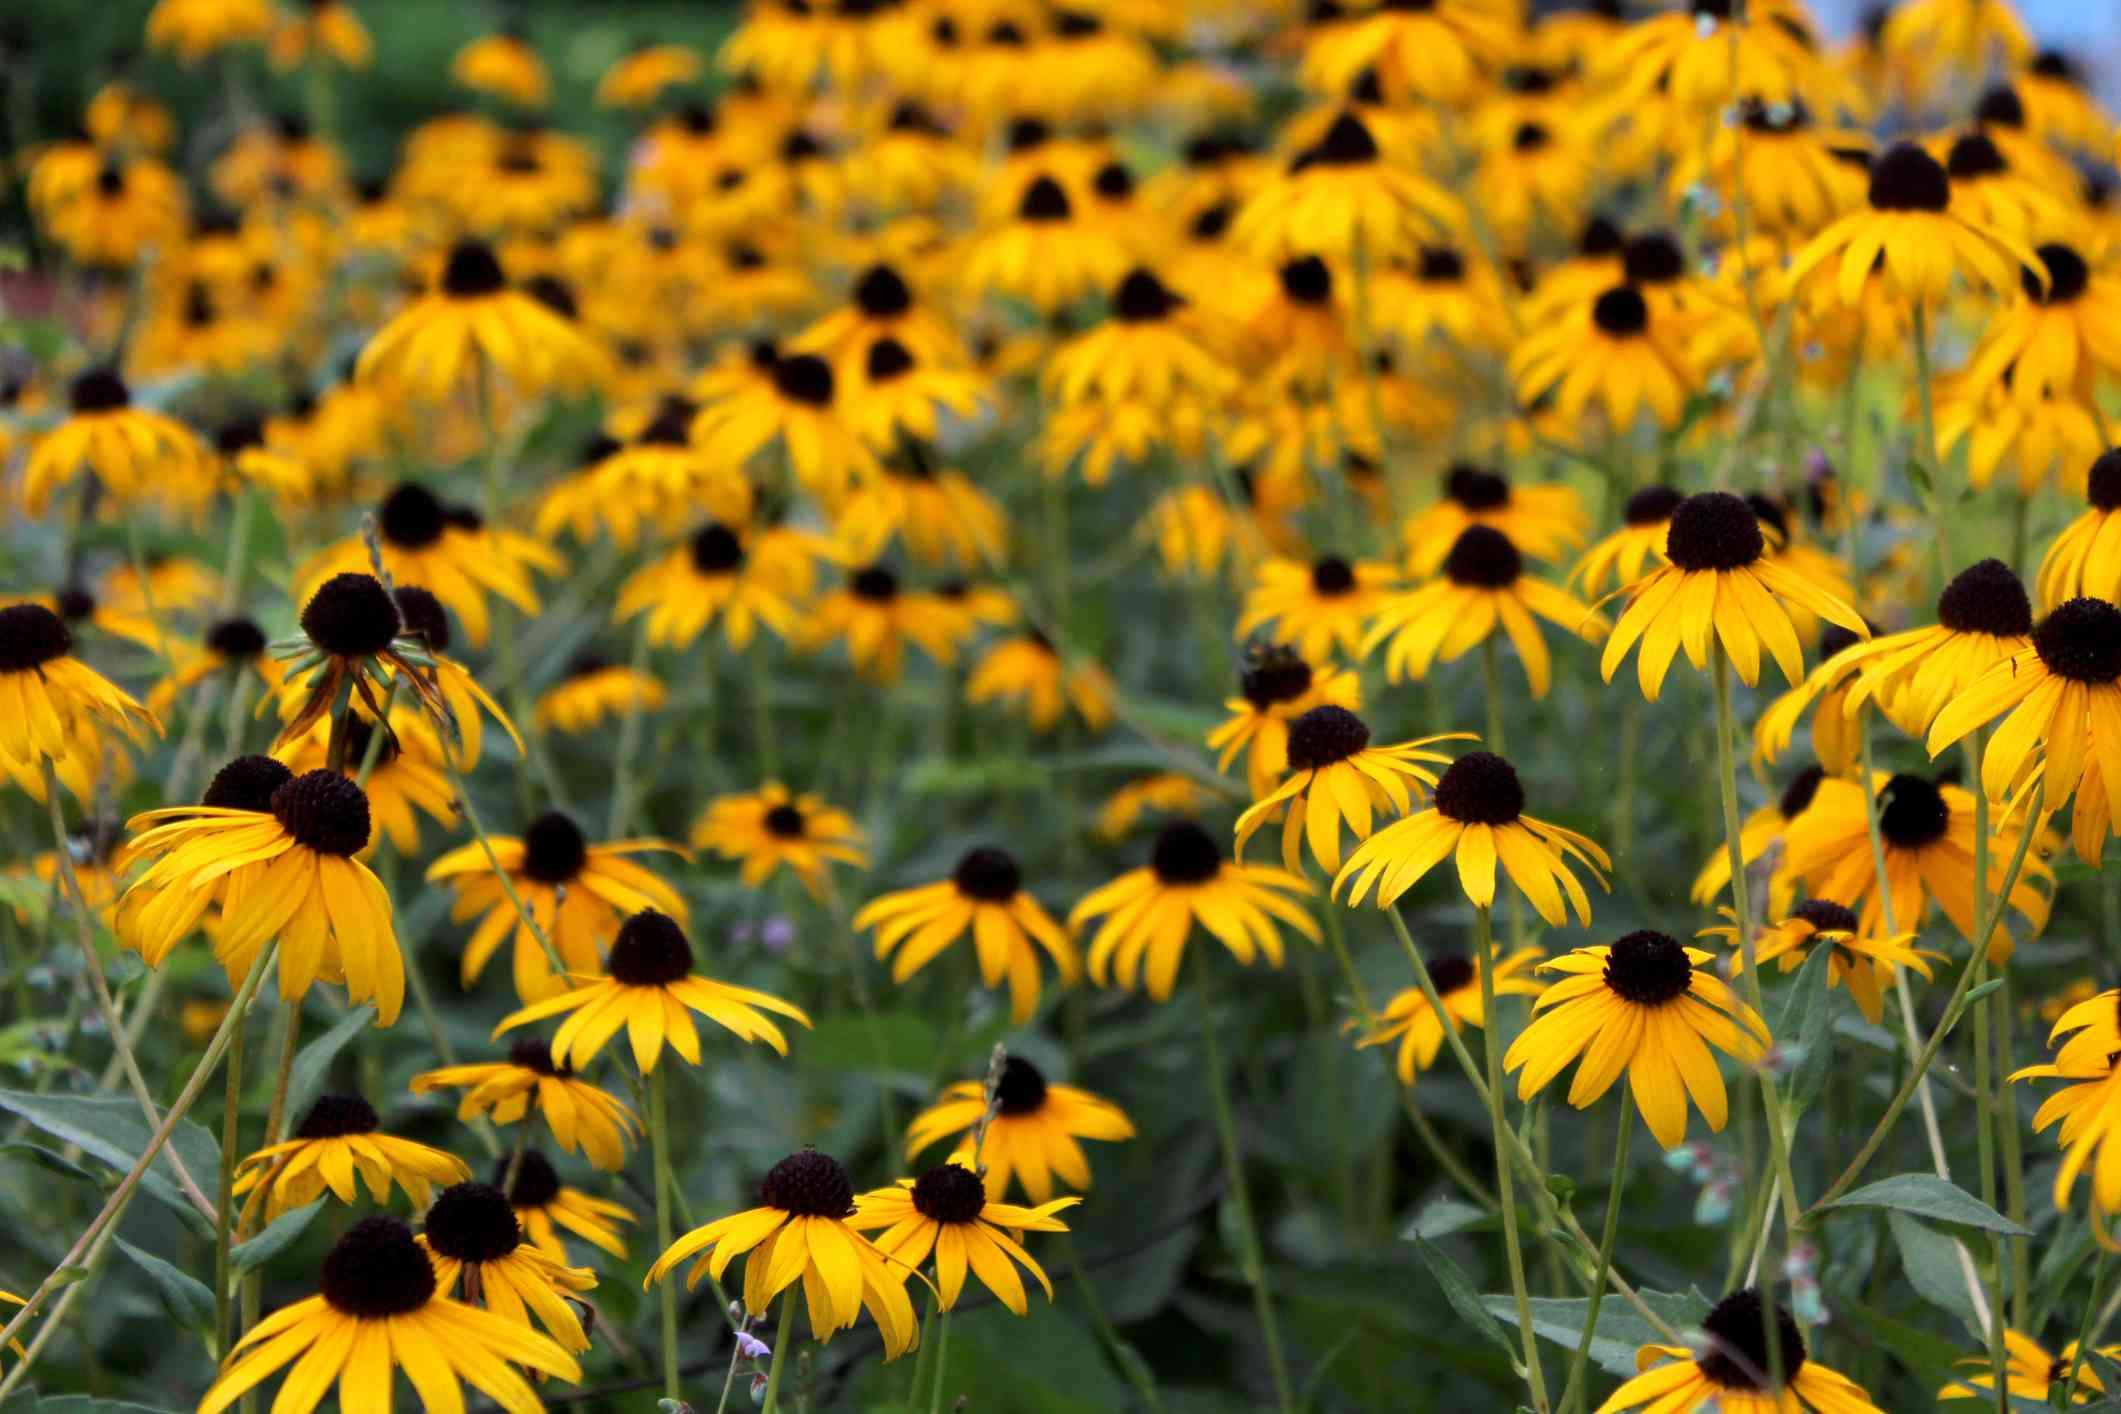 Black-eyed Susan garden